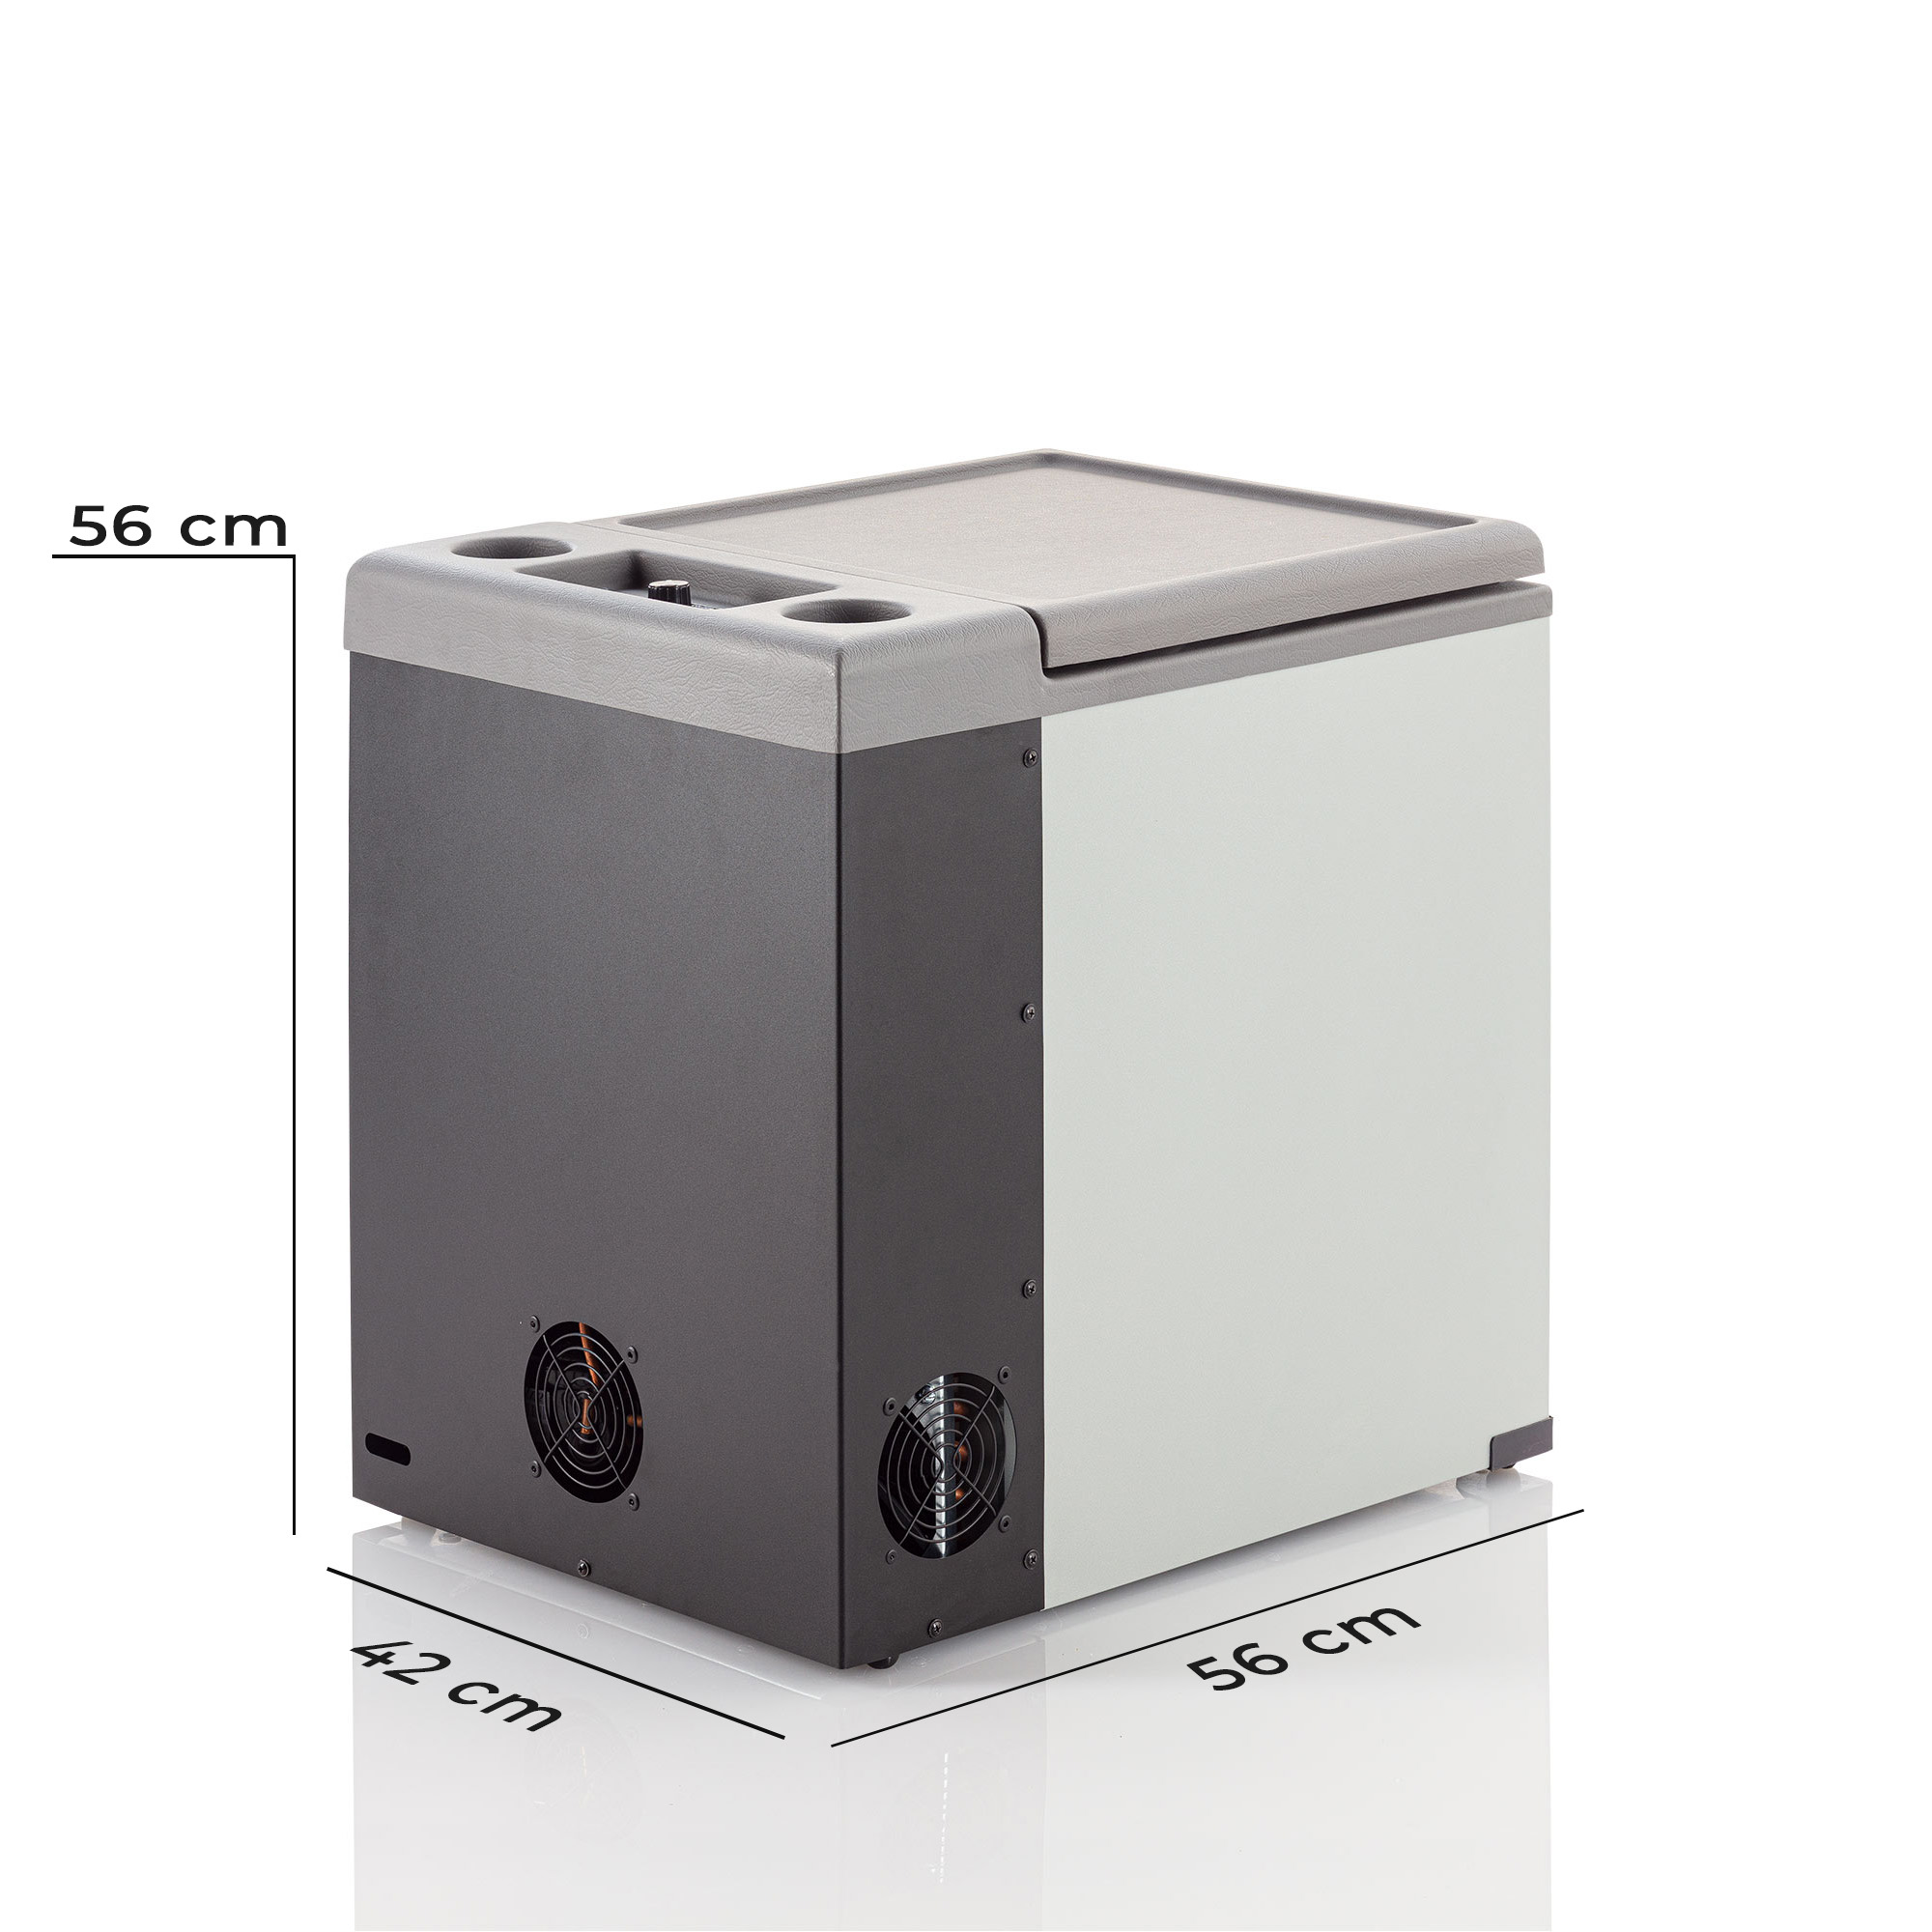 MPO 4255 / 47 LT Soğutucu Araç Buzdolabı